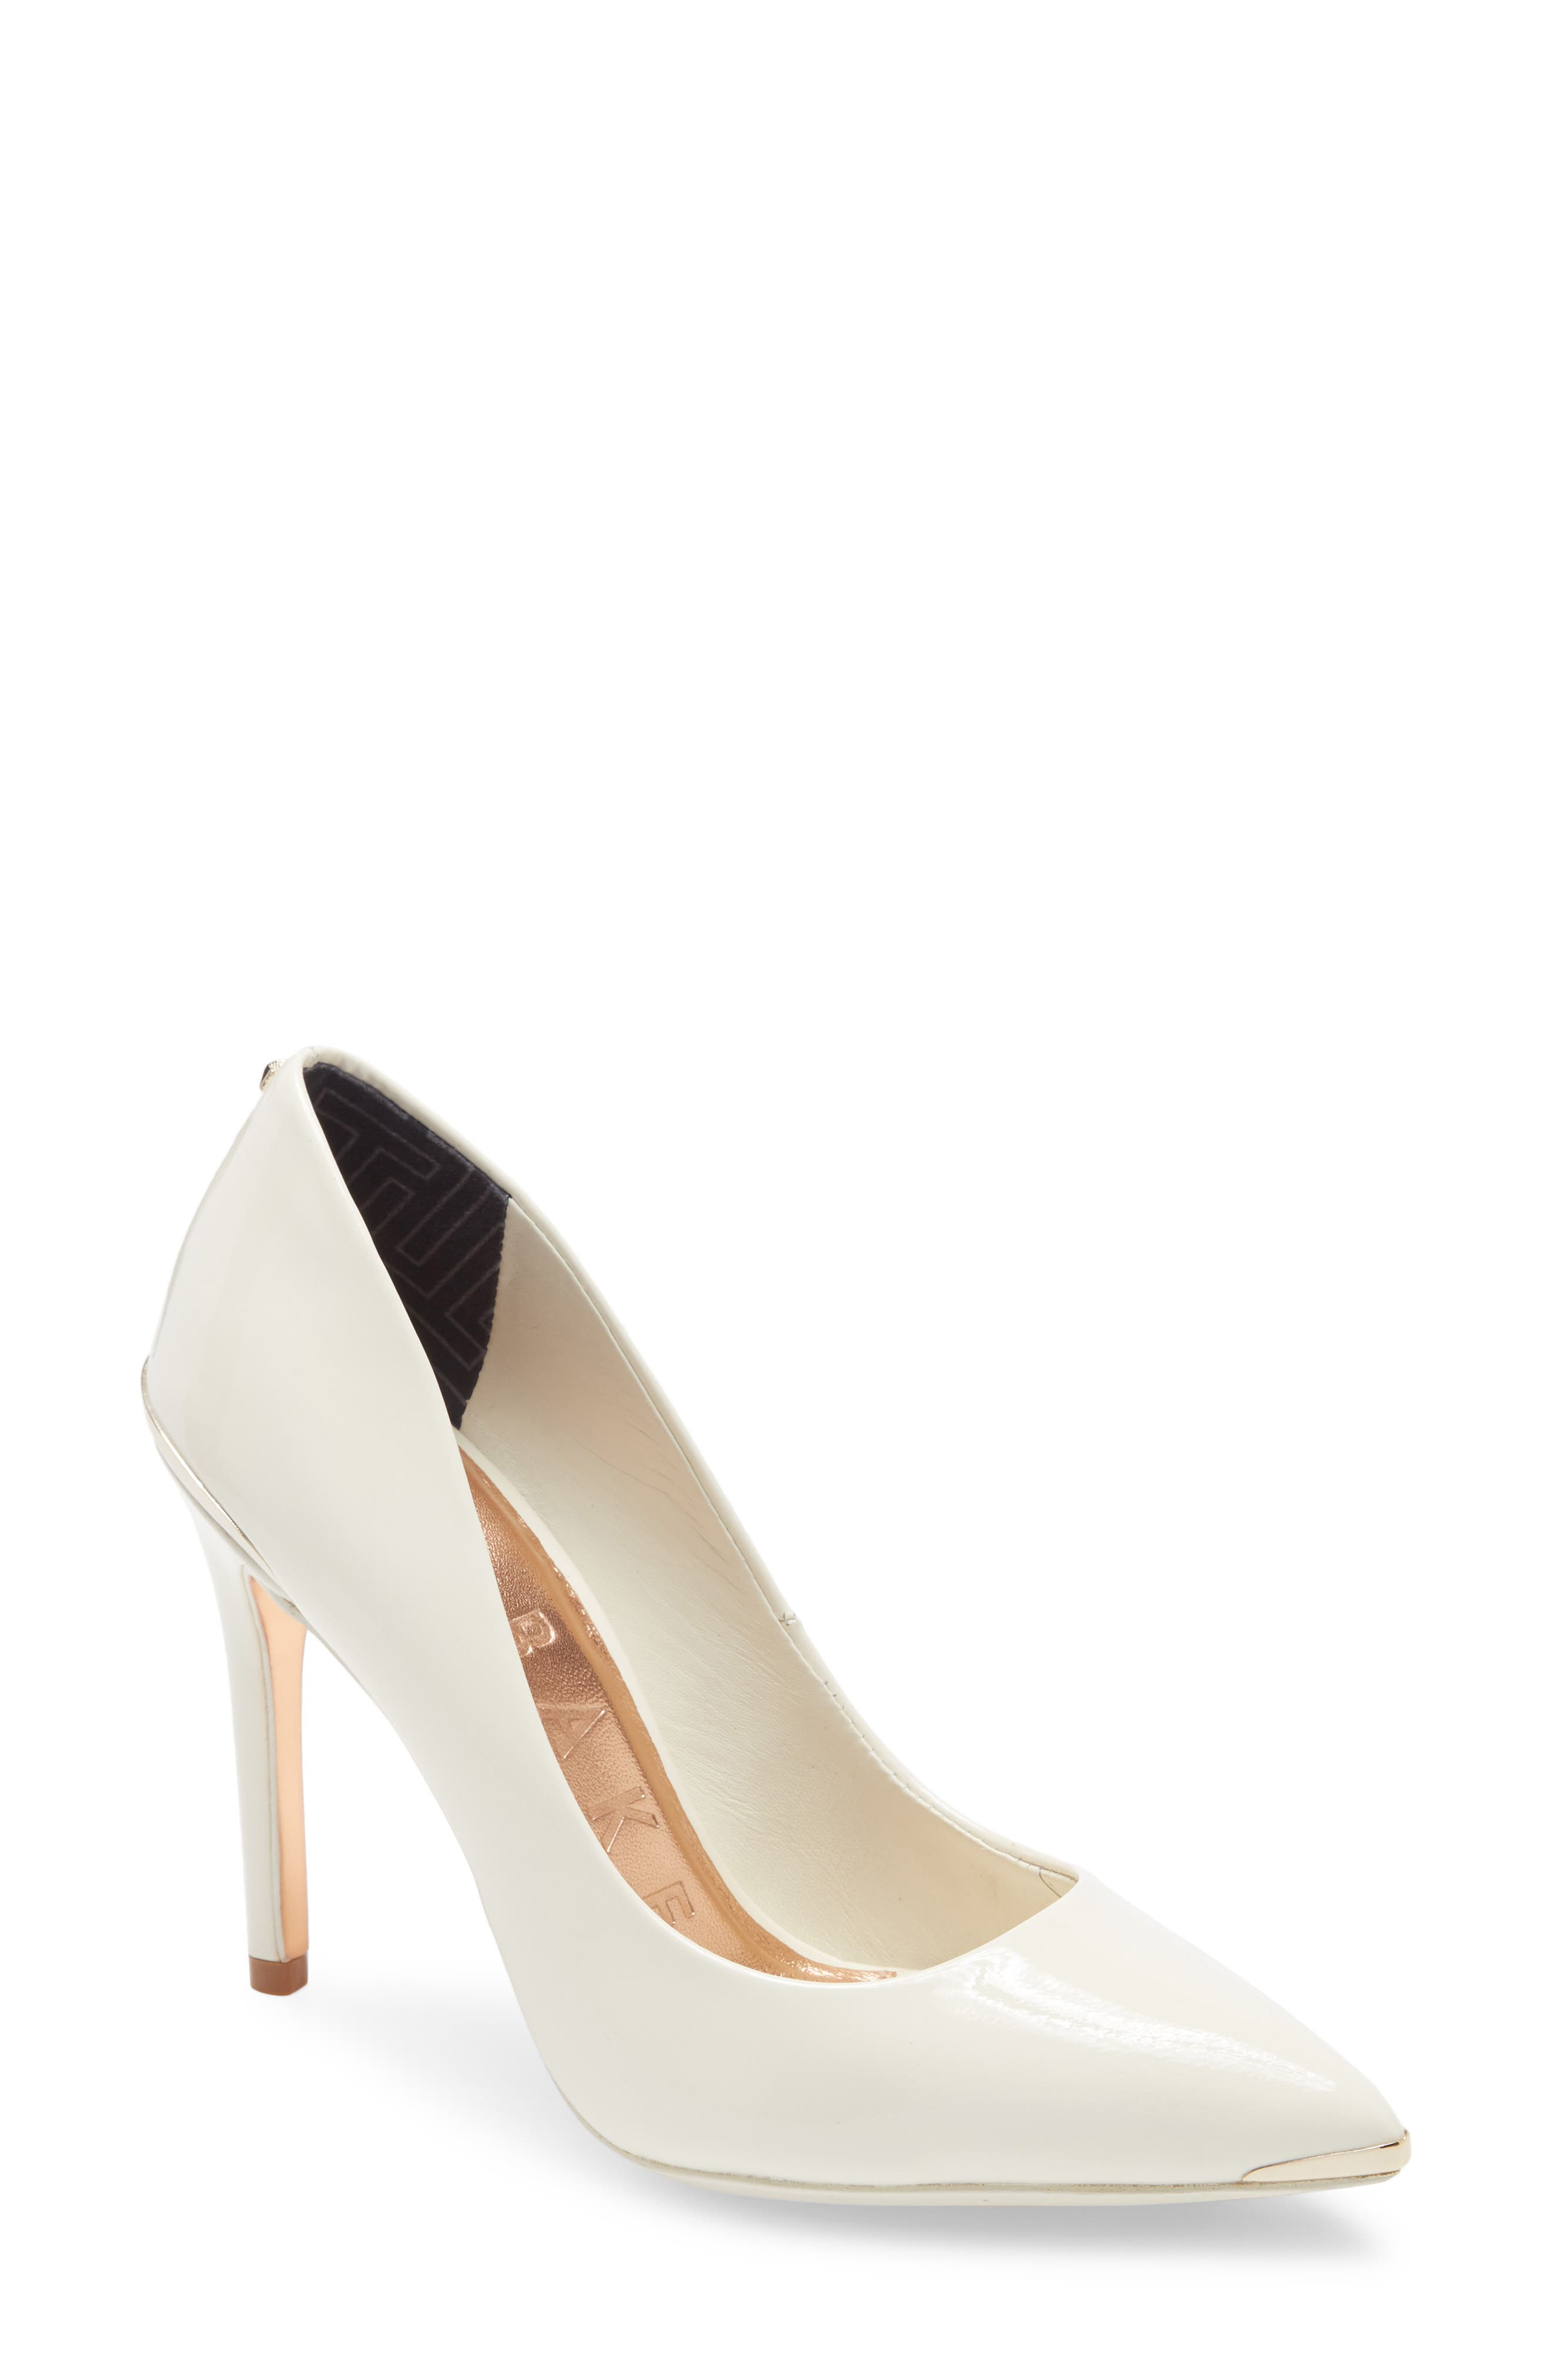 Ted Baker London Shoes Sale \u0026 Clearance